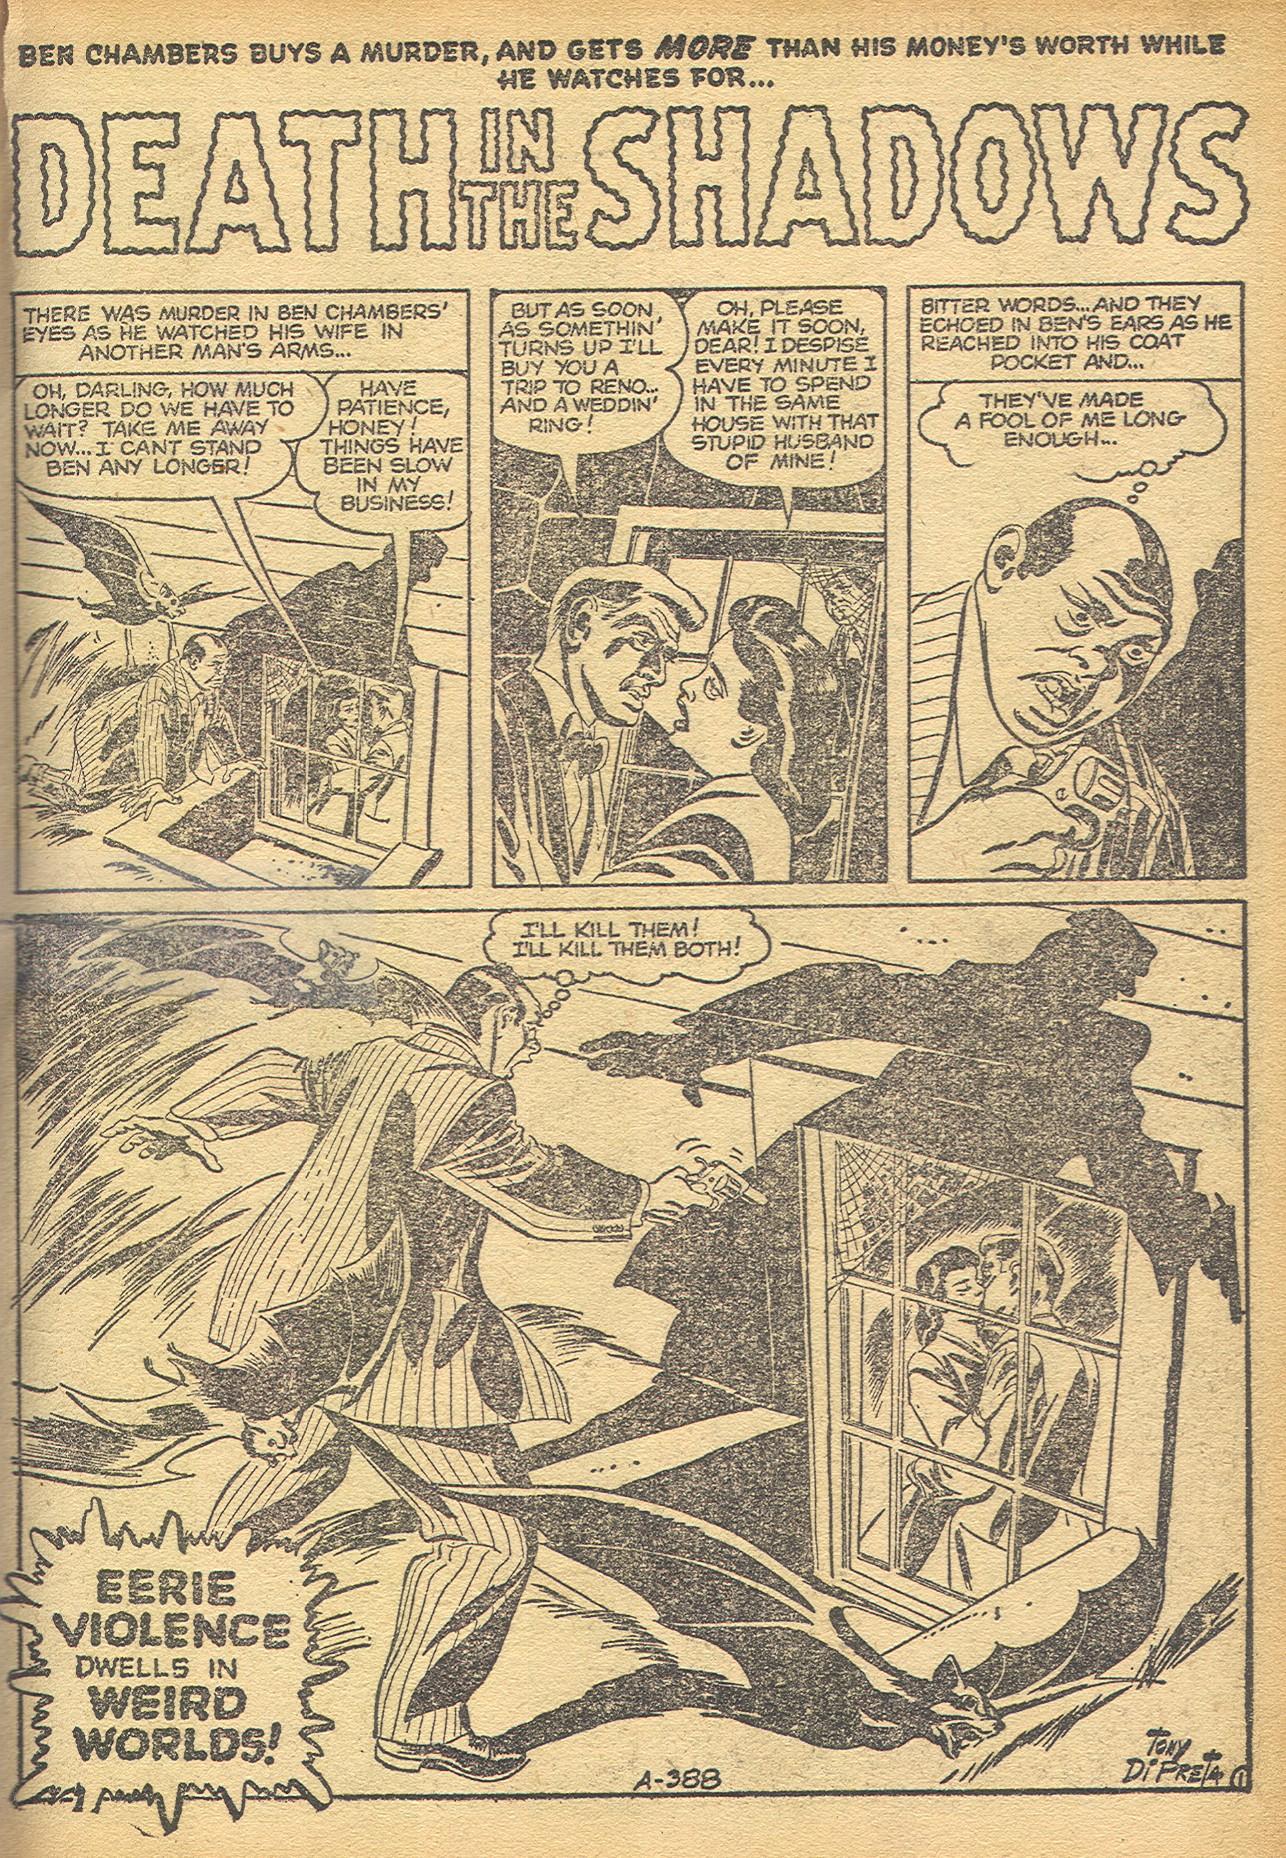 Read online Adventures into Weird Worlds comic -  Issue #8 - 16